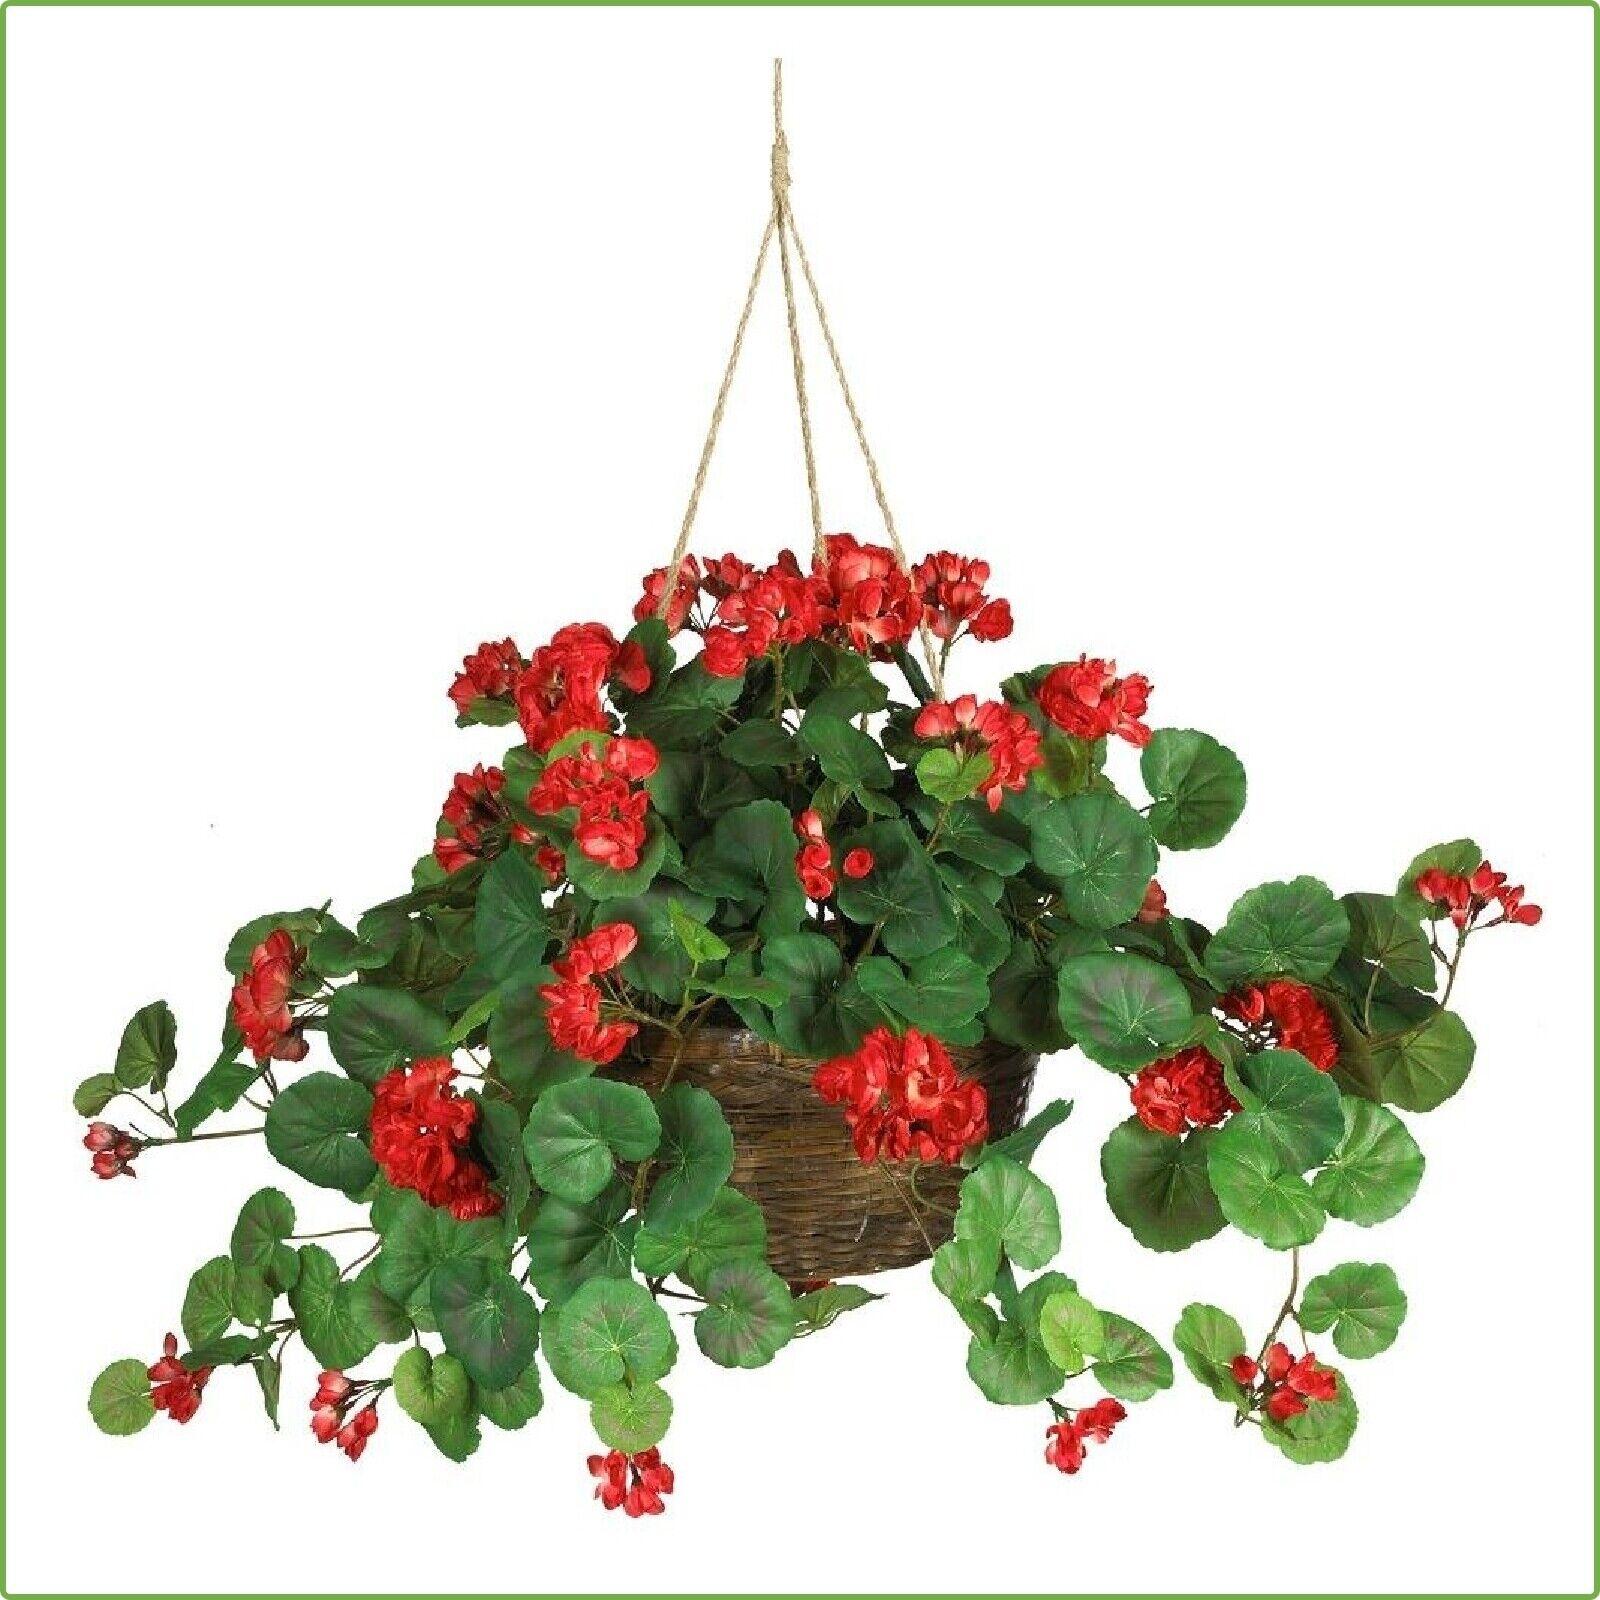 24 In Geranium Silk Hanging Basket Decorative Artificial Fake Plant Flower Pot